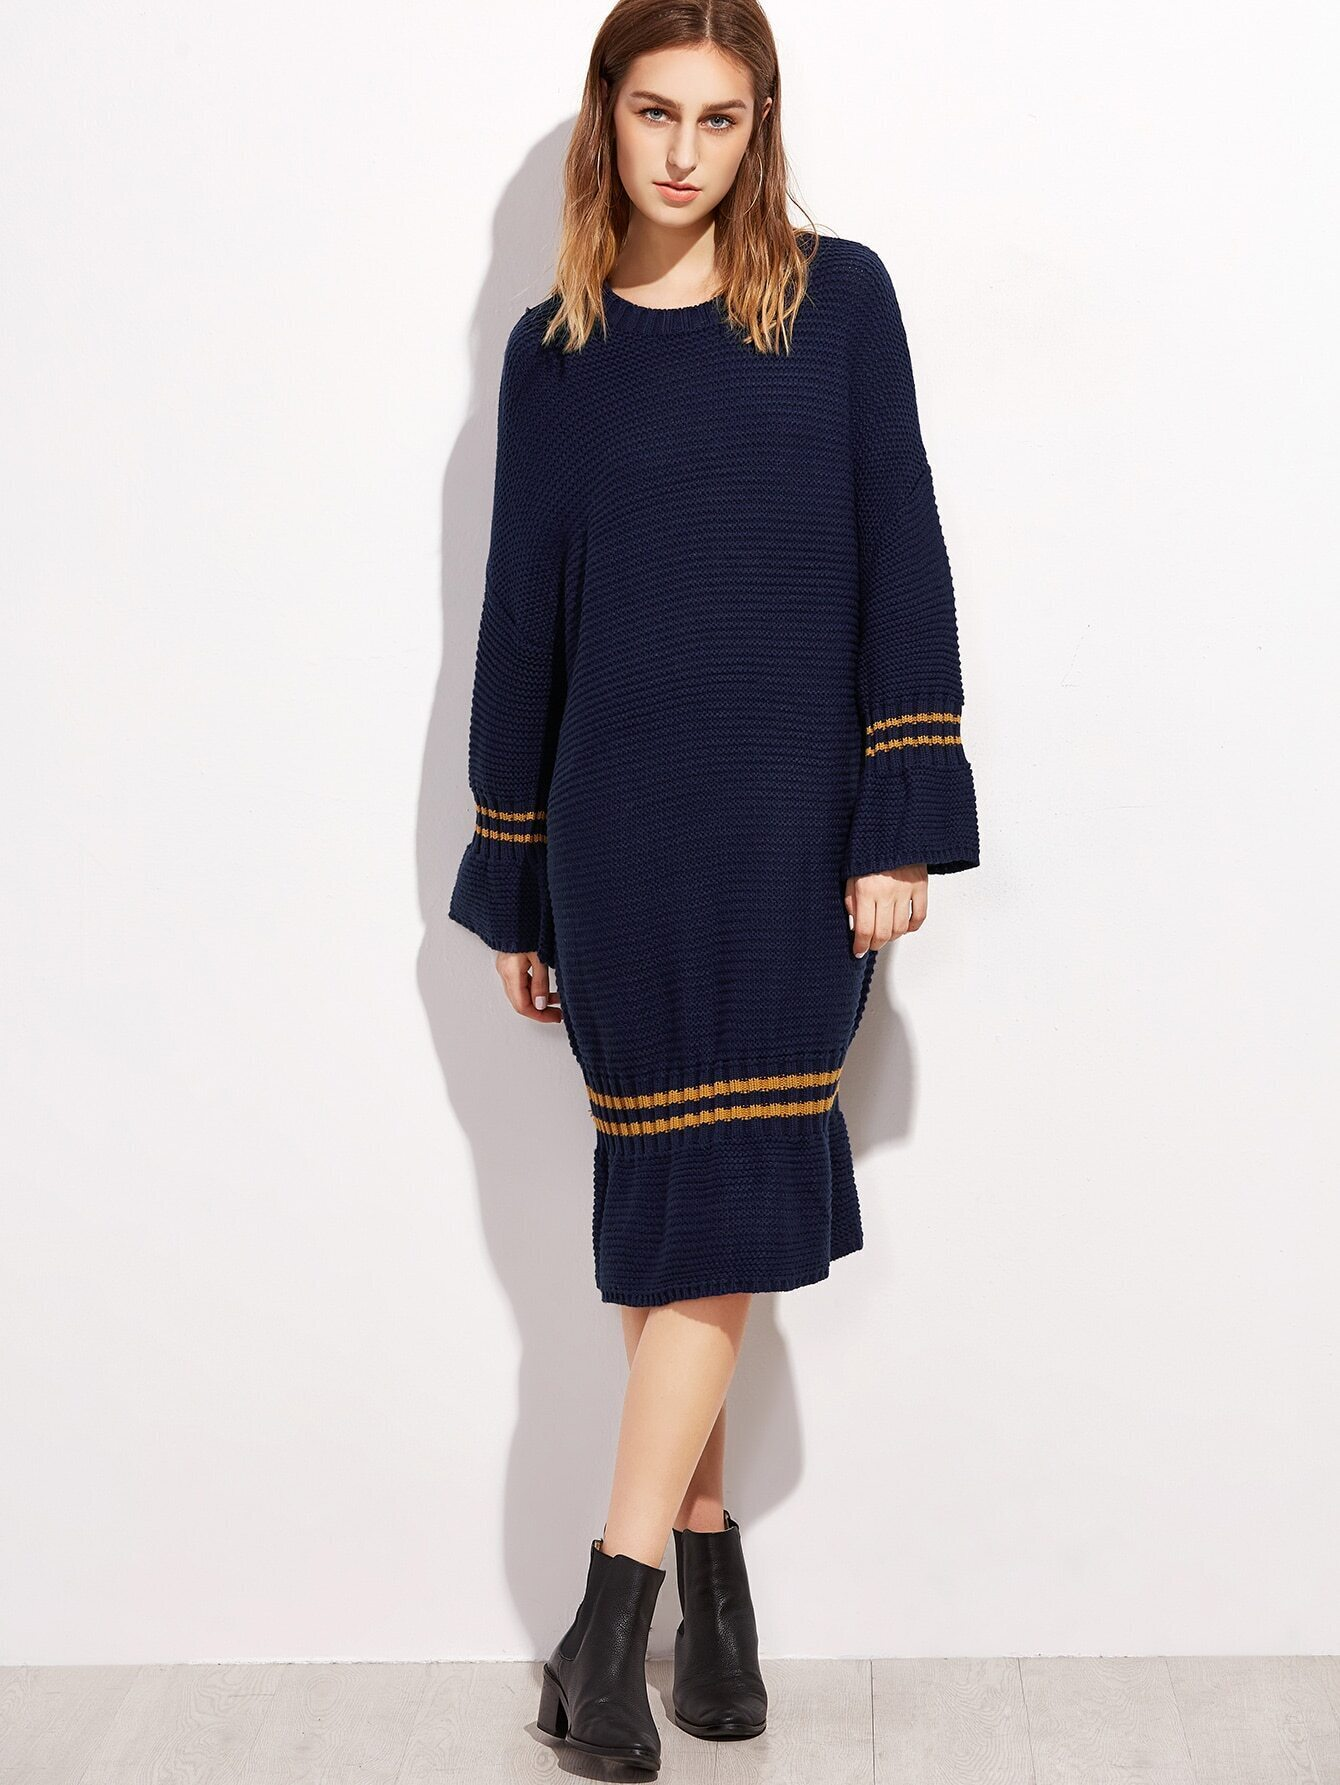 Navy Striped Trim Drop Shoulder Seam Sweater Dress dress161007101